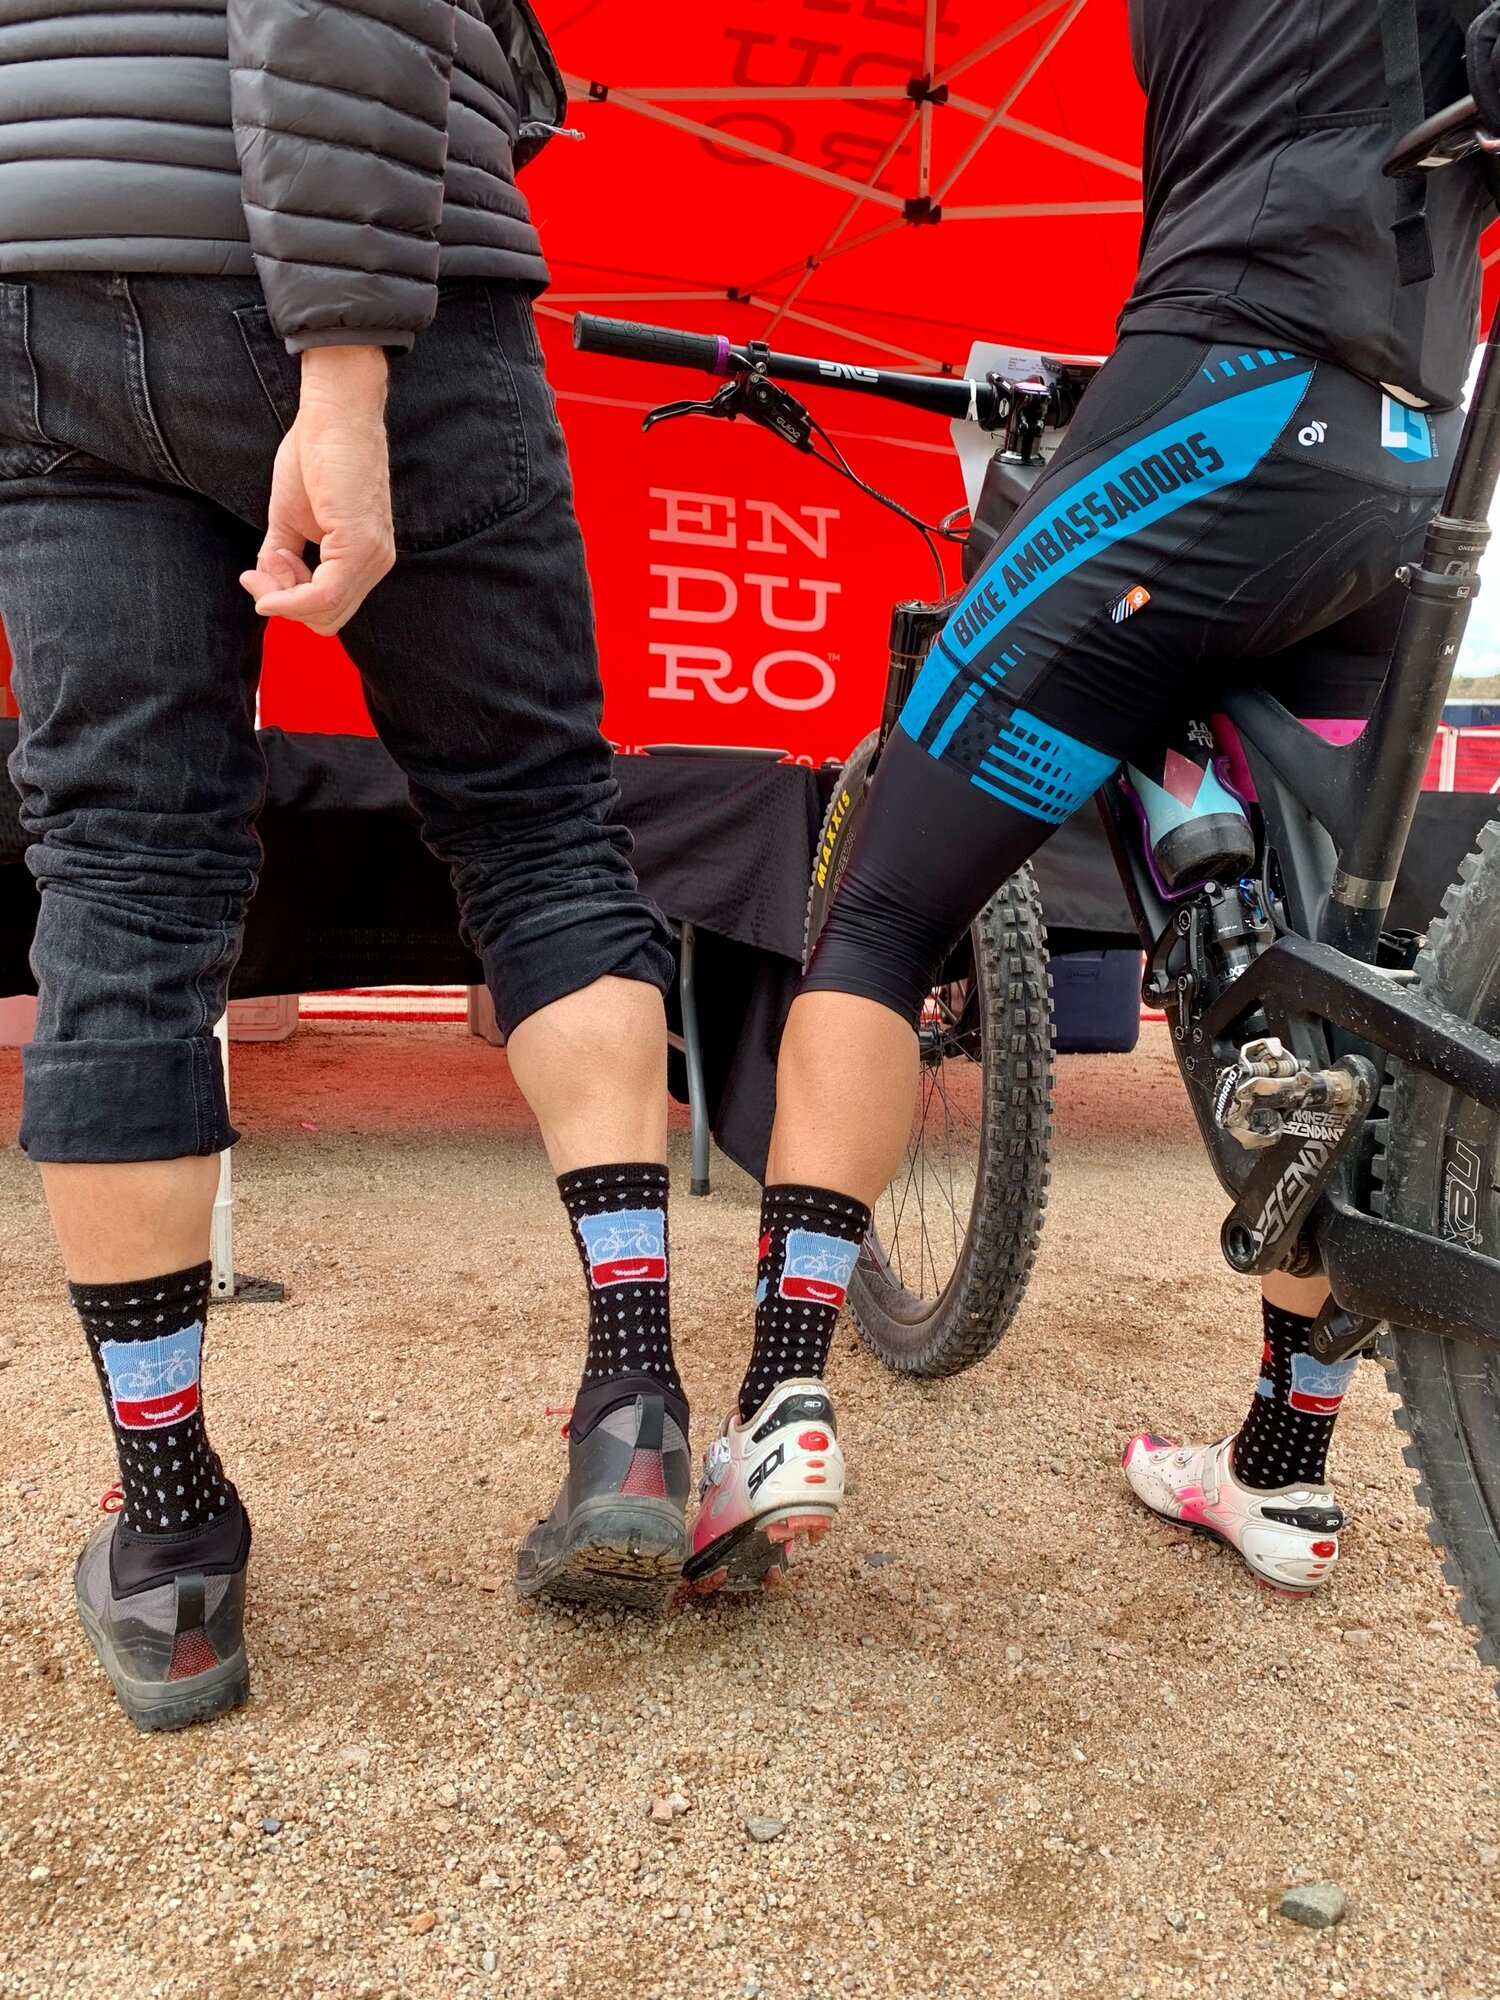 Love it when a fellow PeopleForBikes fan has the same socks ;) 📷 cred: Julie Lyon